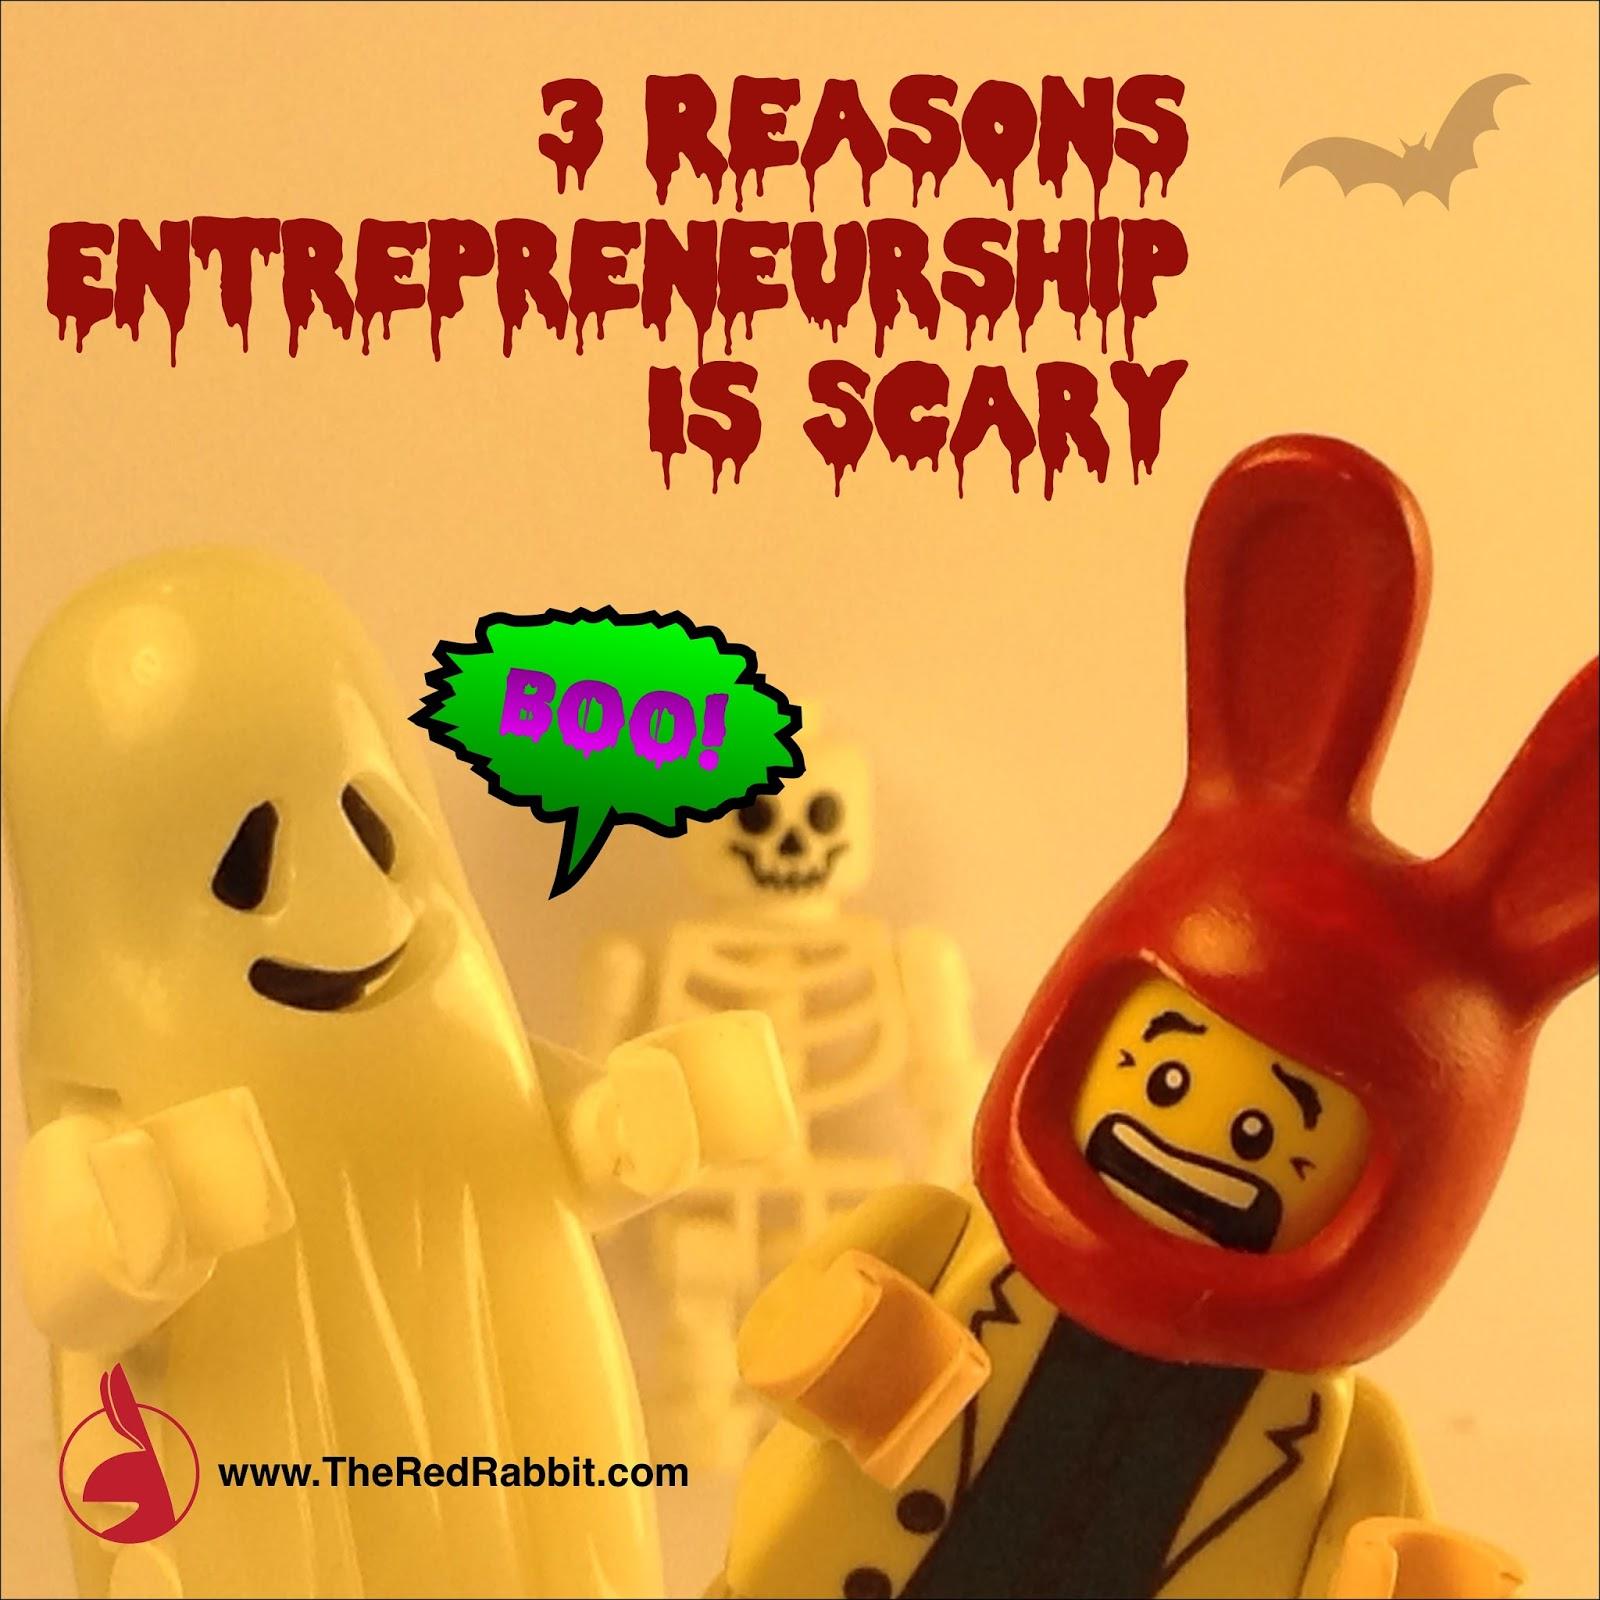 Boo! Entrepreneurship Sacred You